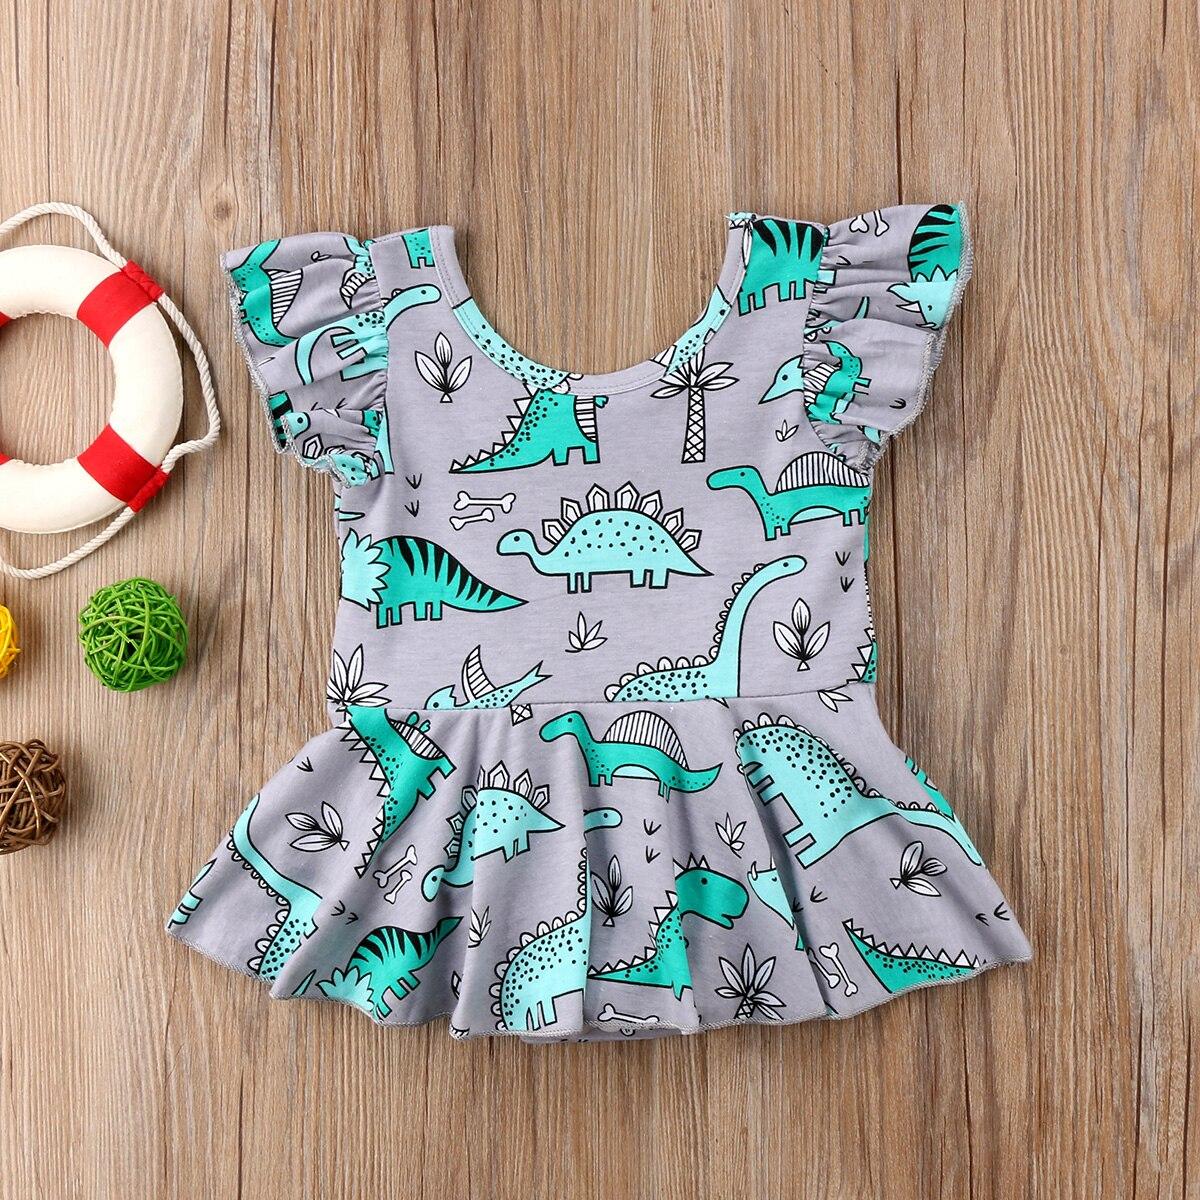 Infant Kids Baby Meisje Dier Romper Jurken Print S Oft Comfatable Outfits Casual 0-24 M Yu Te Koop